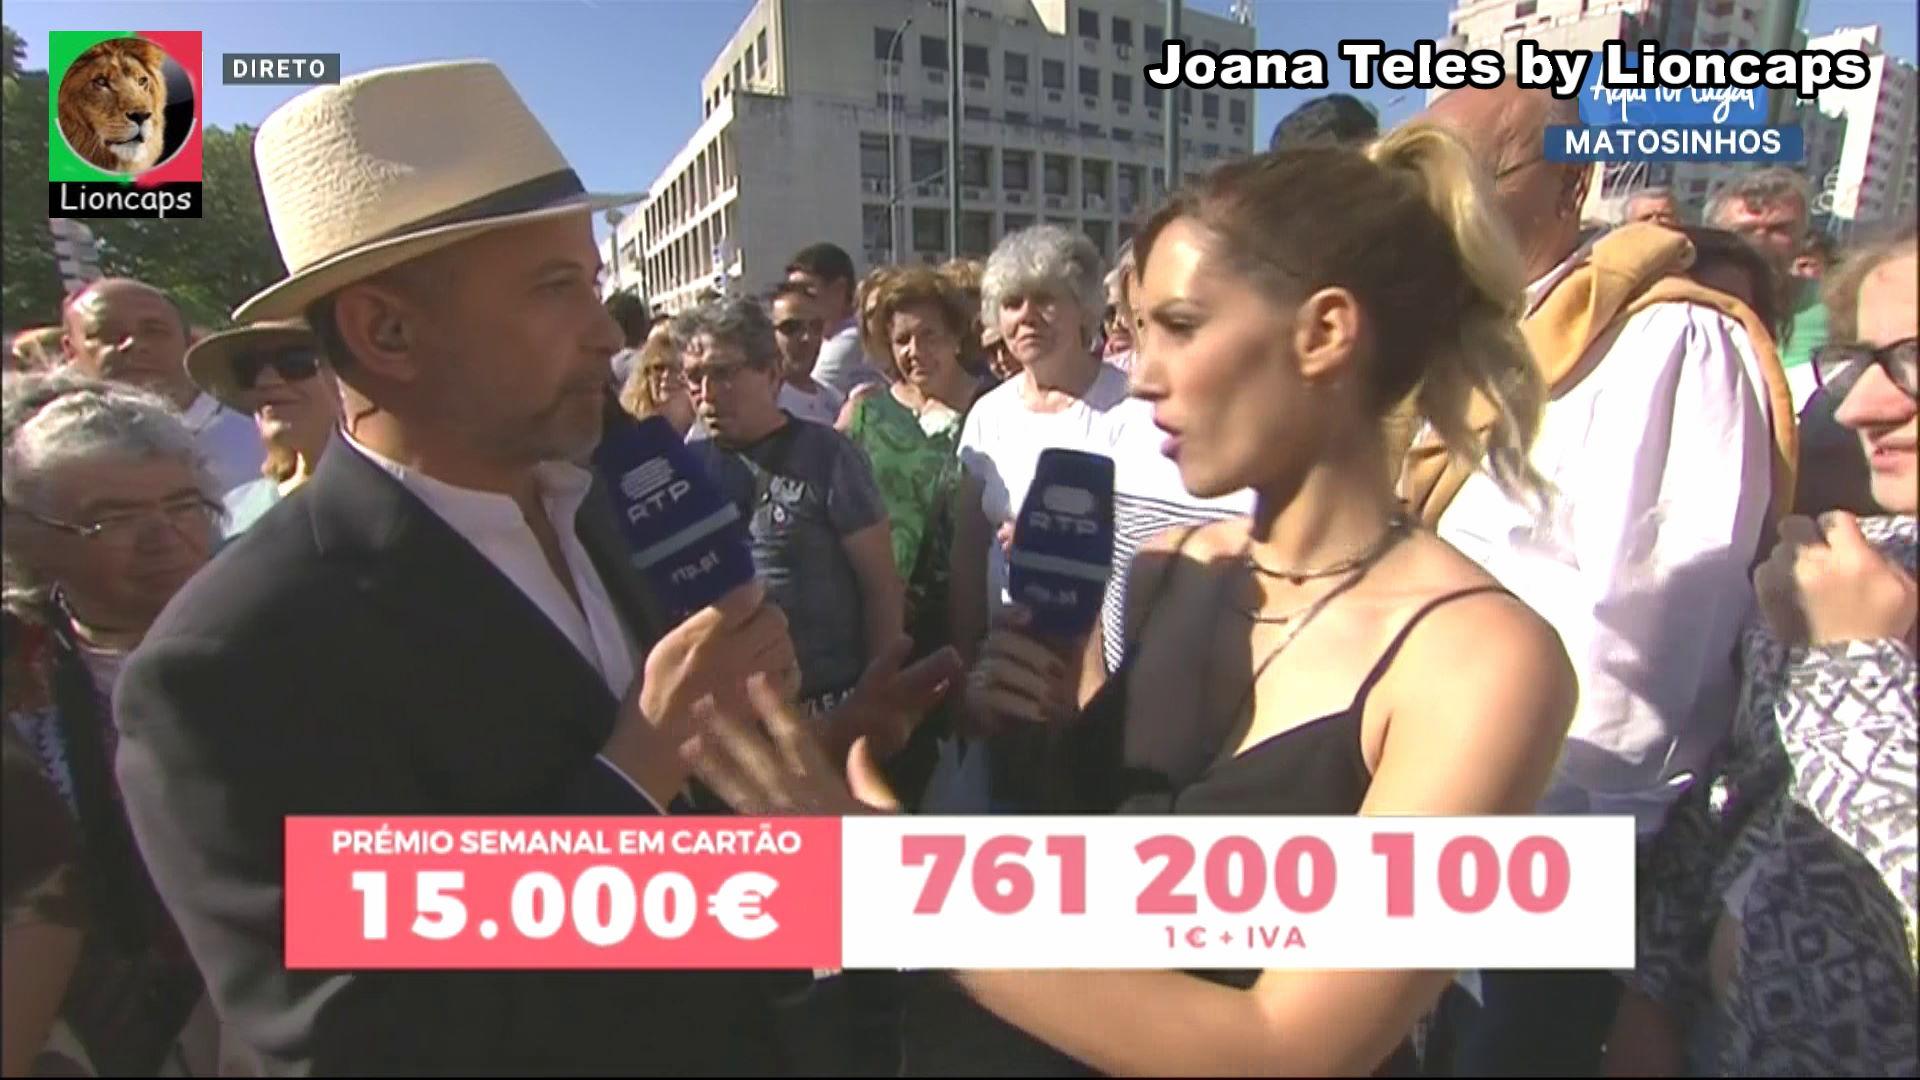 976673220_joana_teles_vs200125_1167_122_397lo.JPG